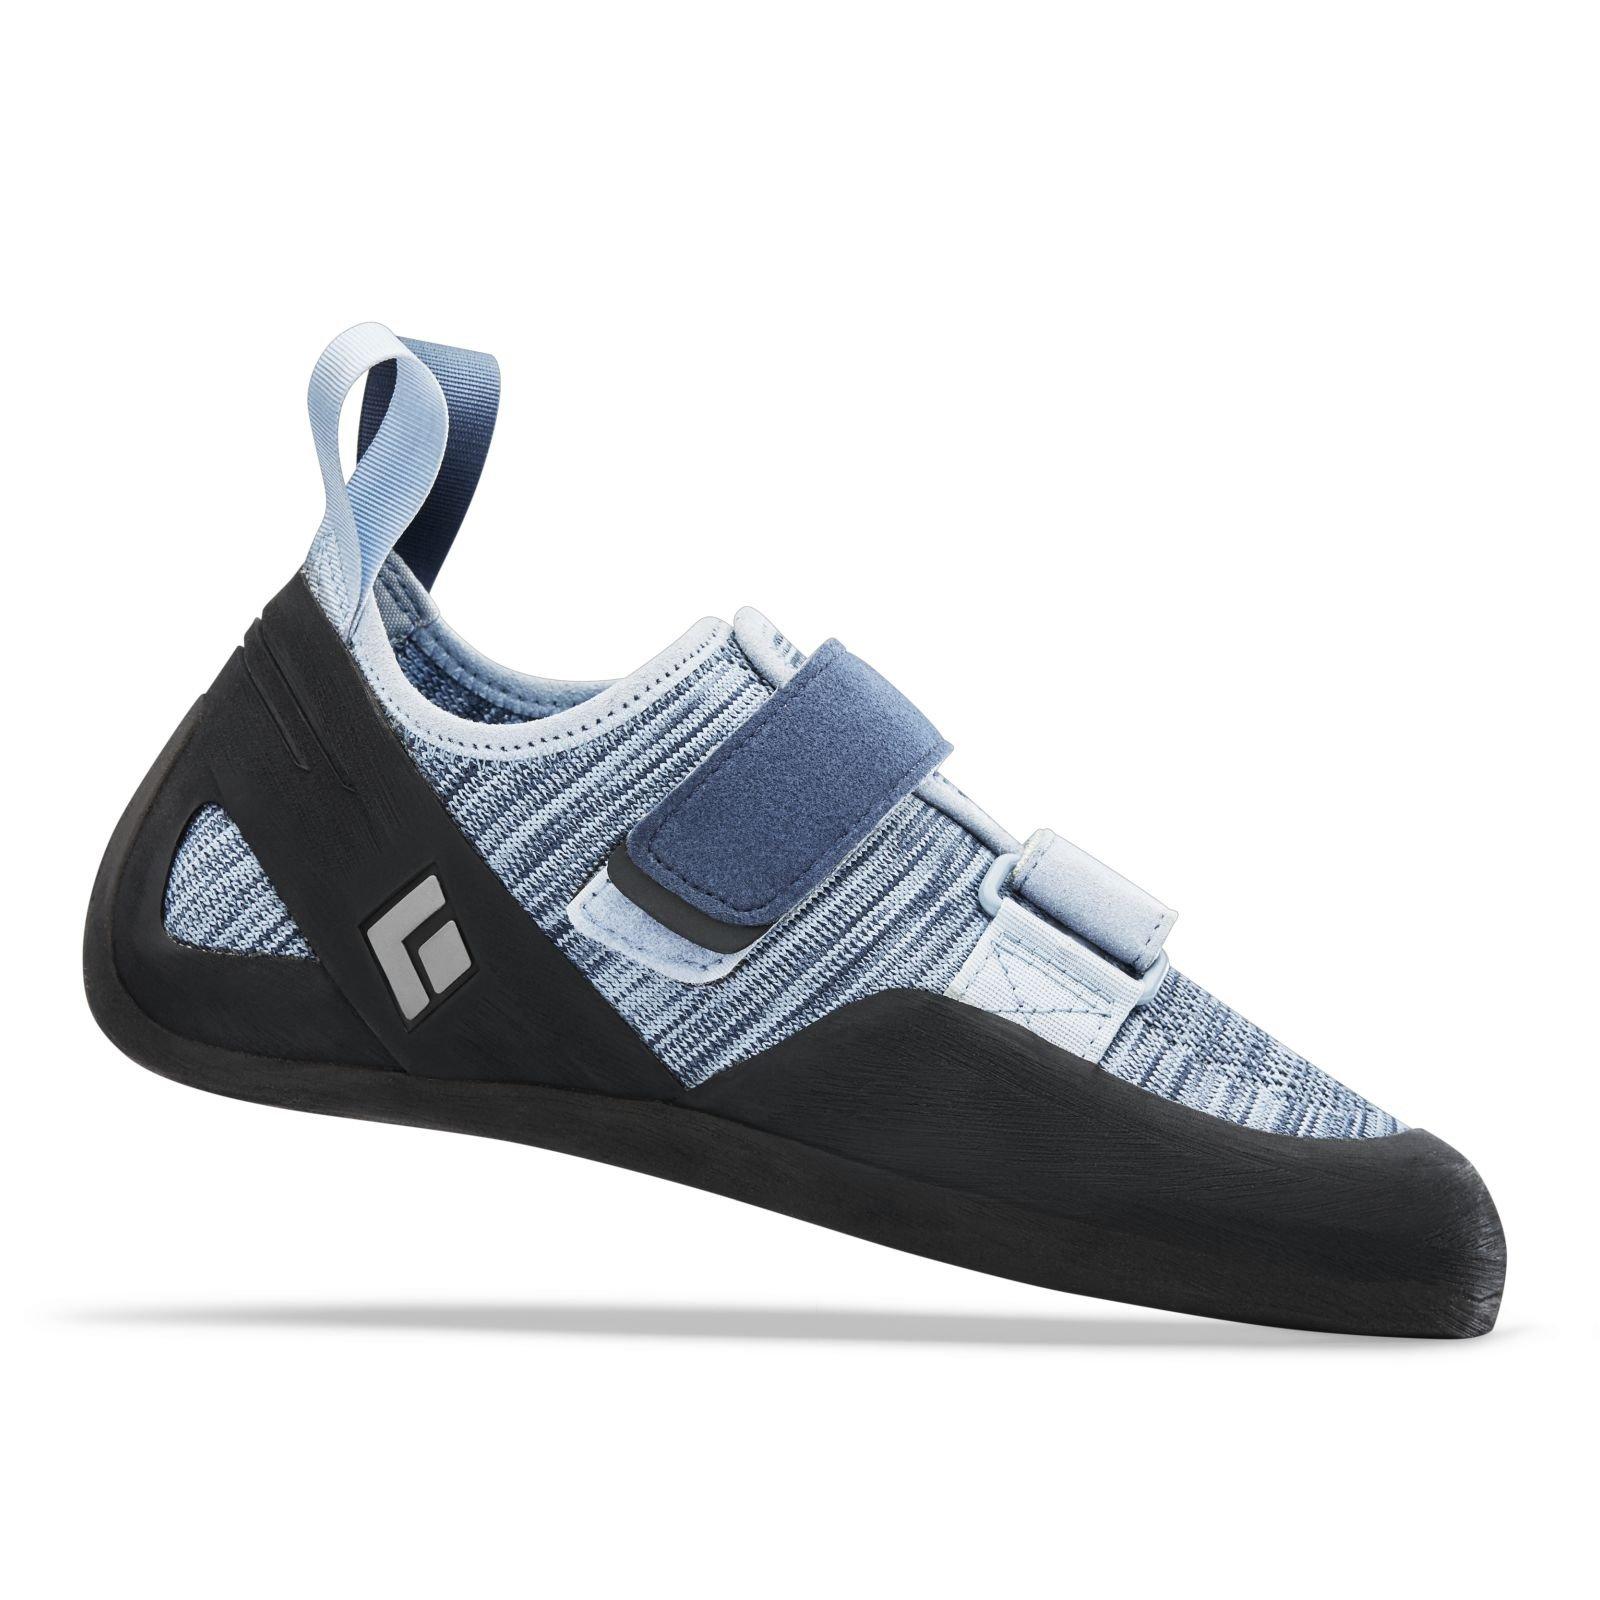 Black Diamond Momentum Climbing Shoe - Women's Aluminum 9.5 by Black Diamond